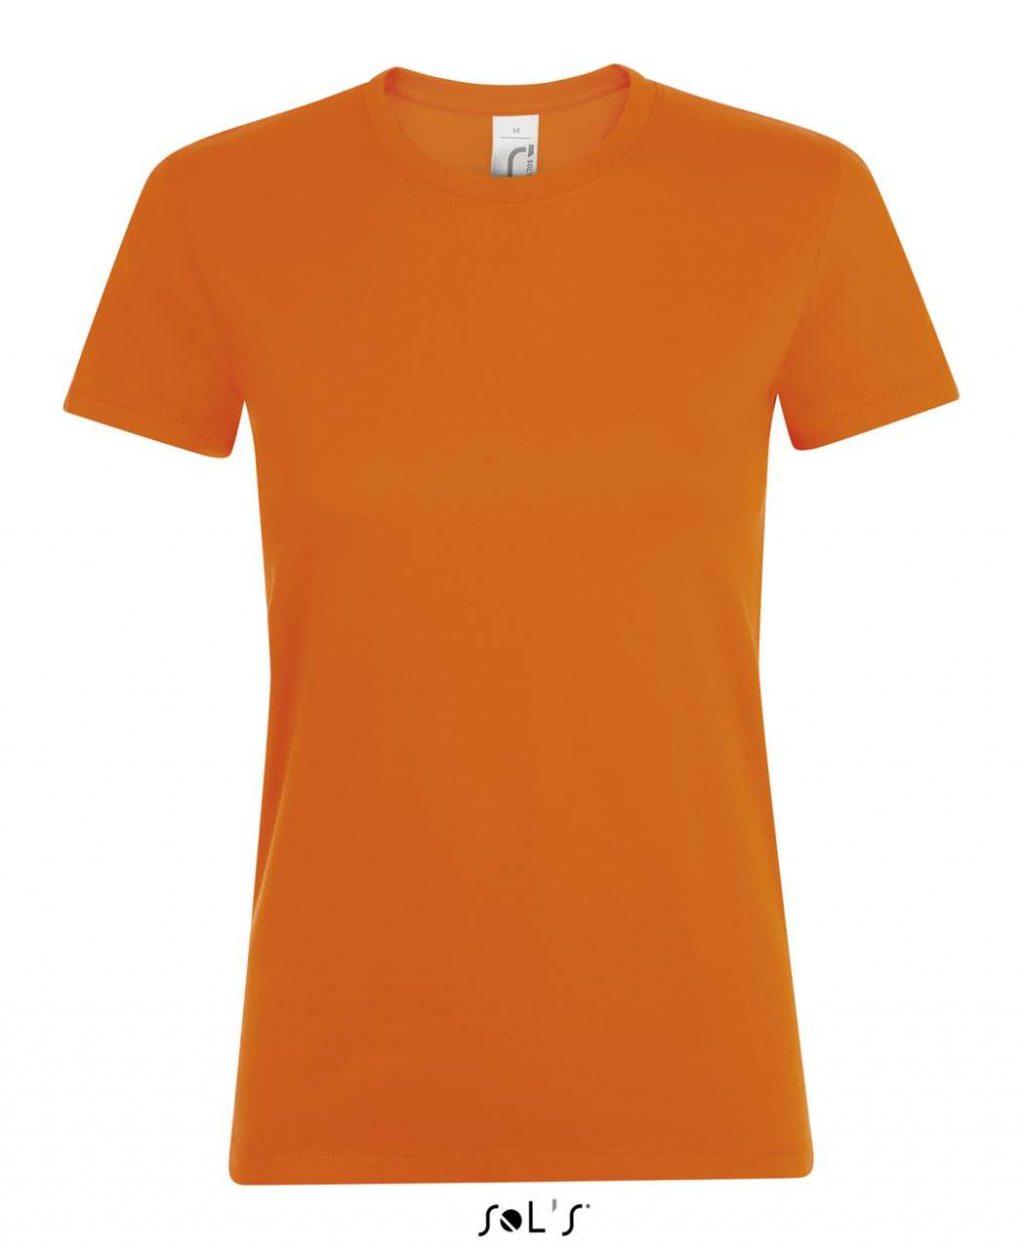 Sols Regent dama SO01825 portocaliu orange Tricouri dama barbatesti maneca scurta maneca lunga broderie serigrafie termotransfer personalizate bumbac DTG croiala fit semi cusaturi laterale tubular | Toroadv.ro